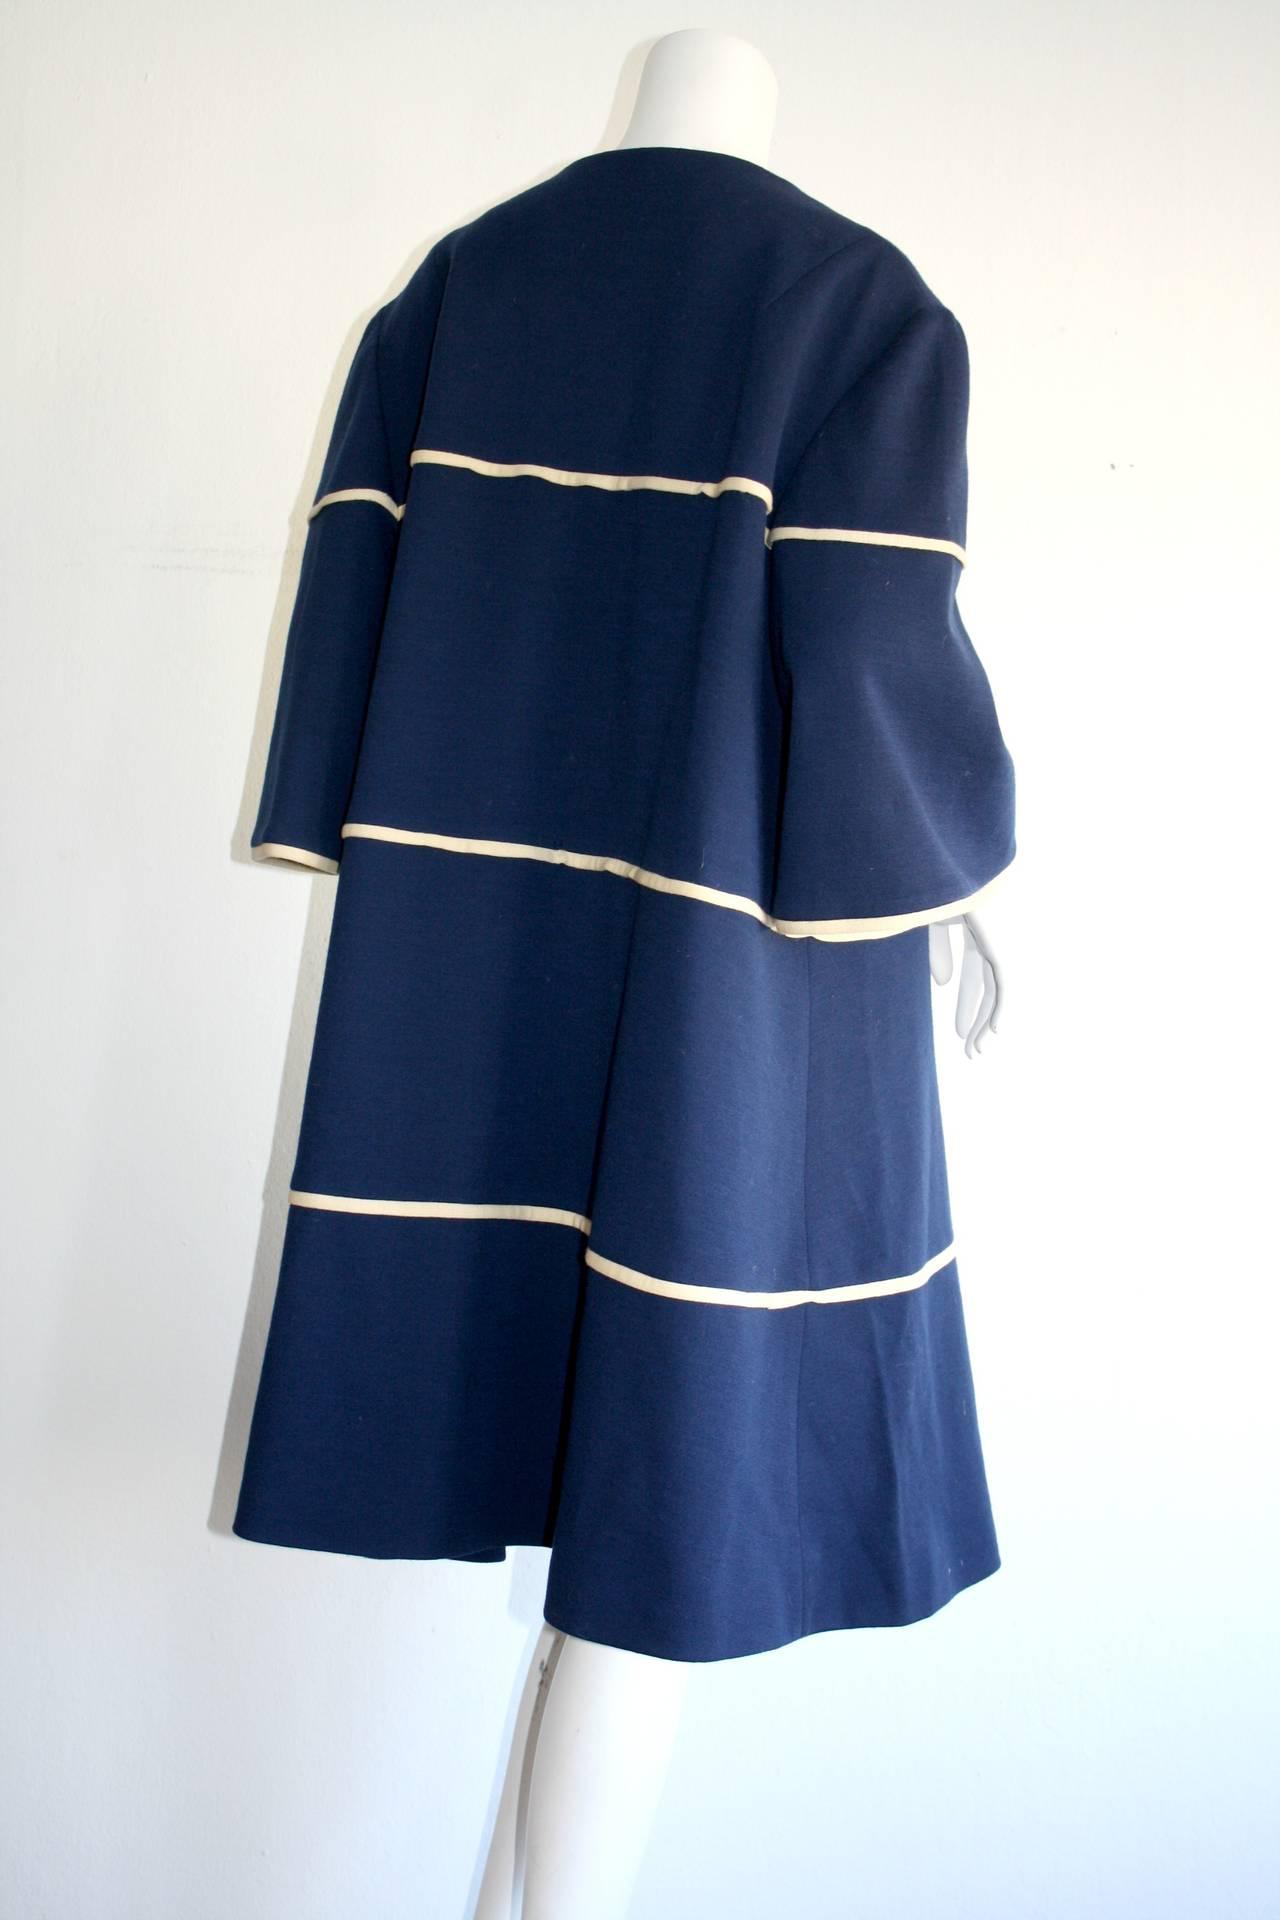 Lilli Ann 1960s Vintage Navy Blue & White Swing Jacket Trapeze Coat 5